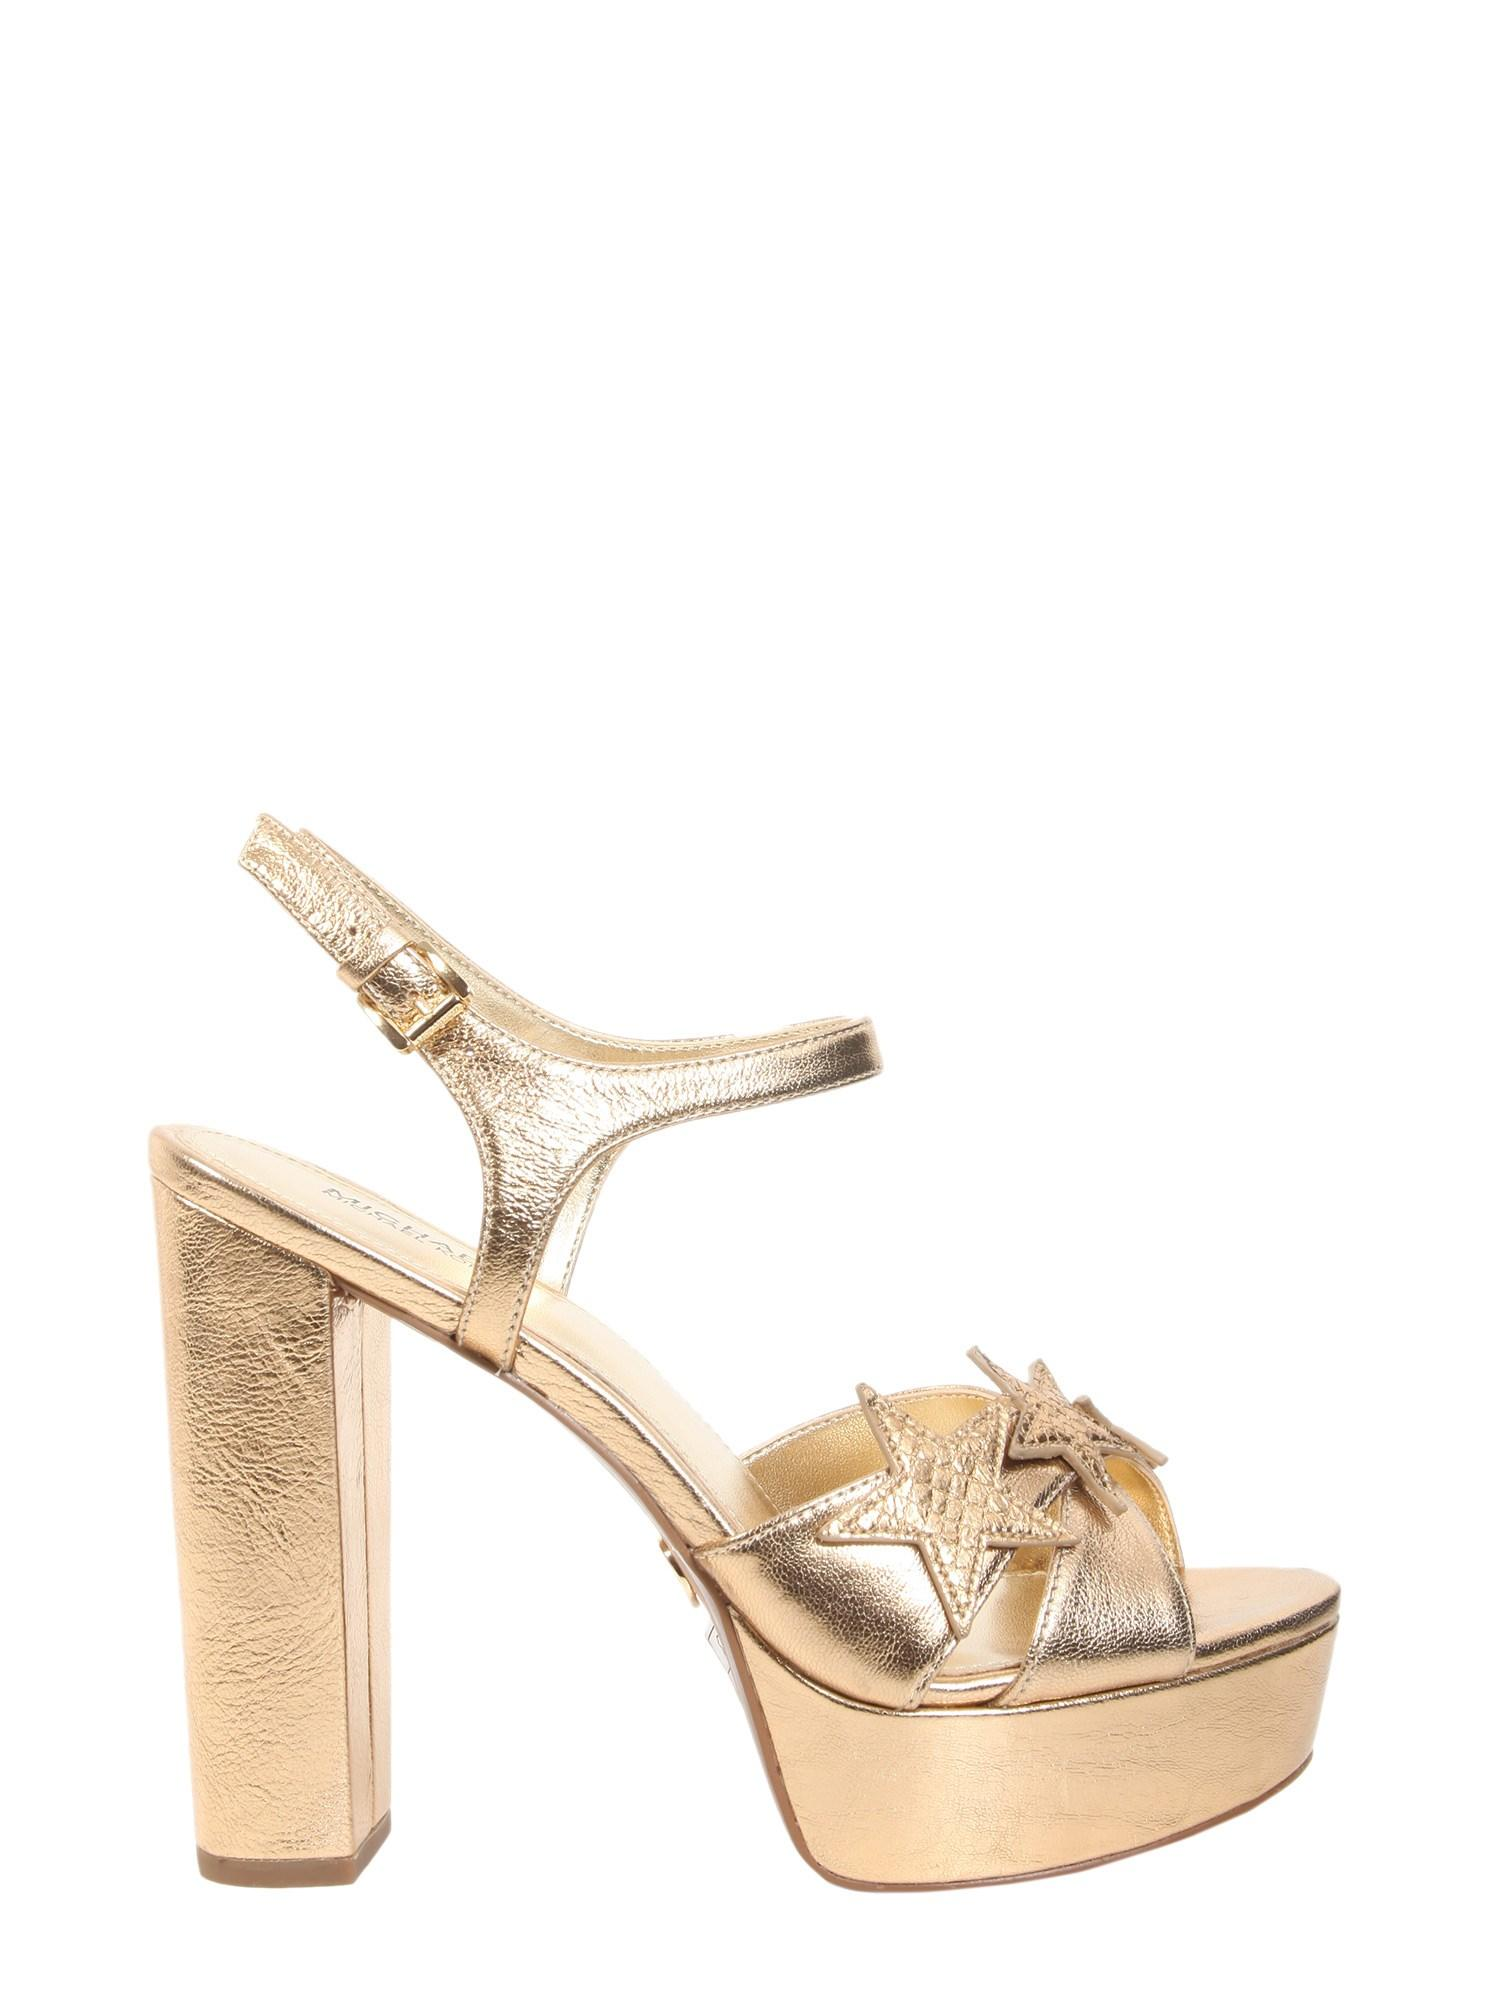 76d34bca0c2c MICHAEL Michael Kors Lexie Platform Sandals In Metallic Leather in ...